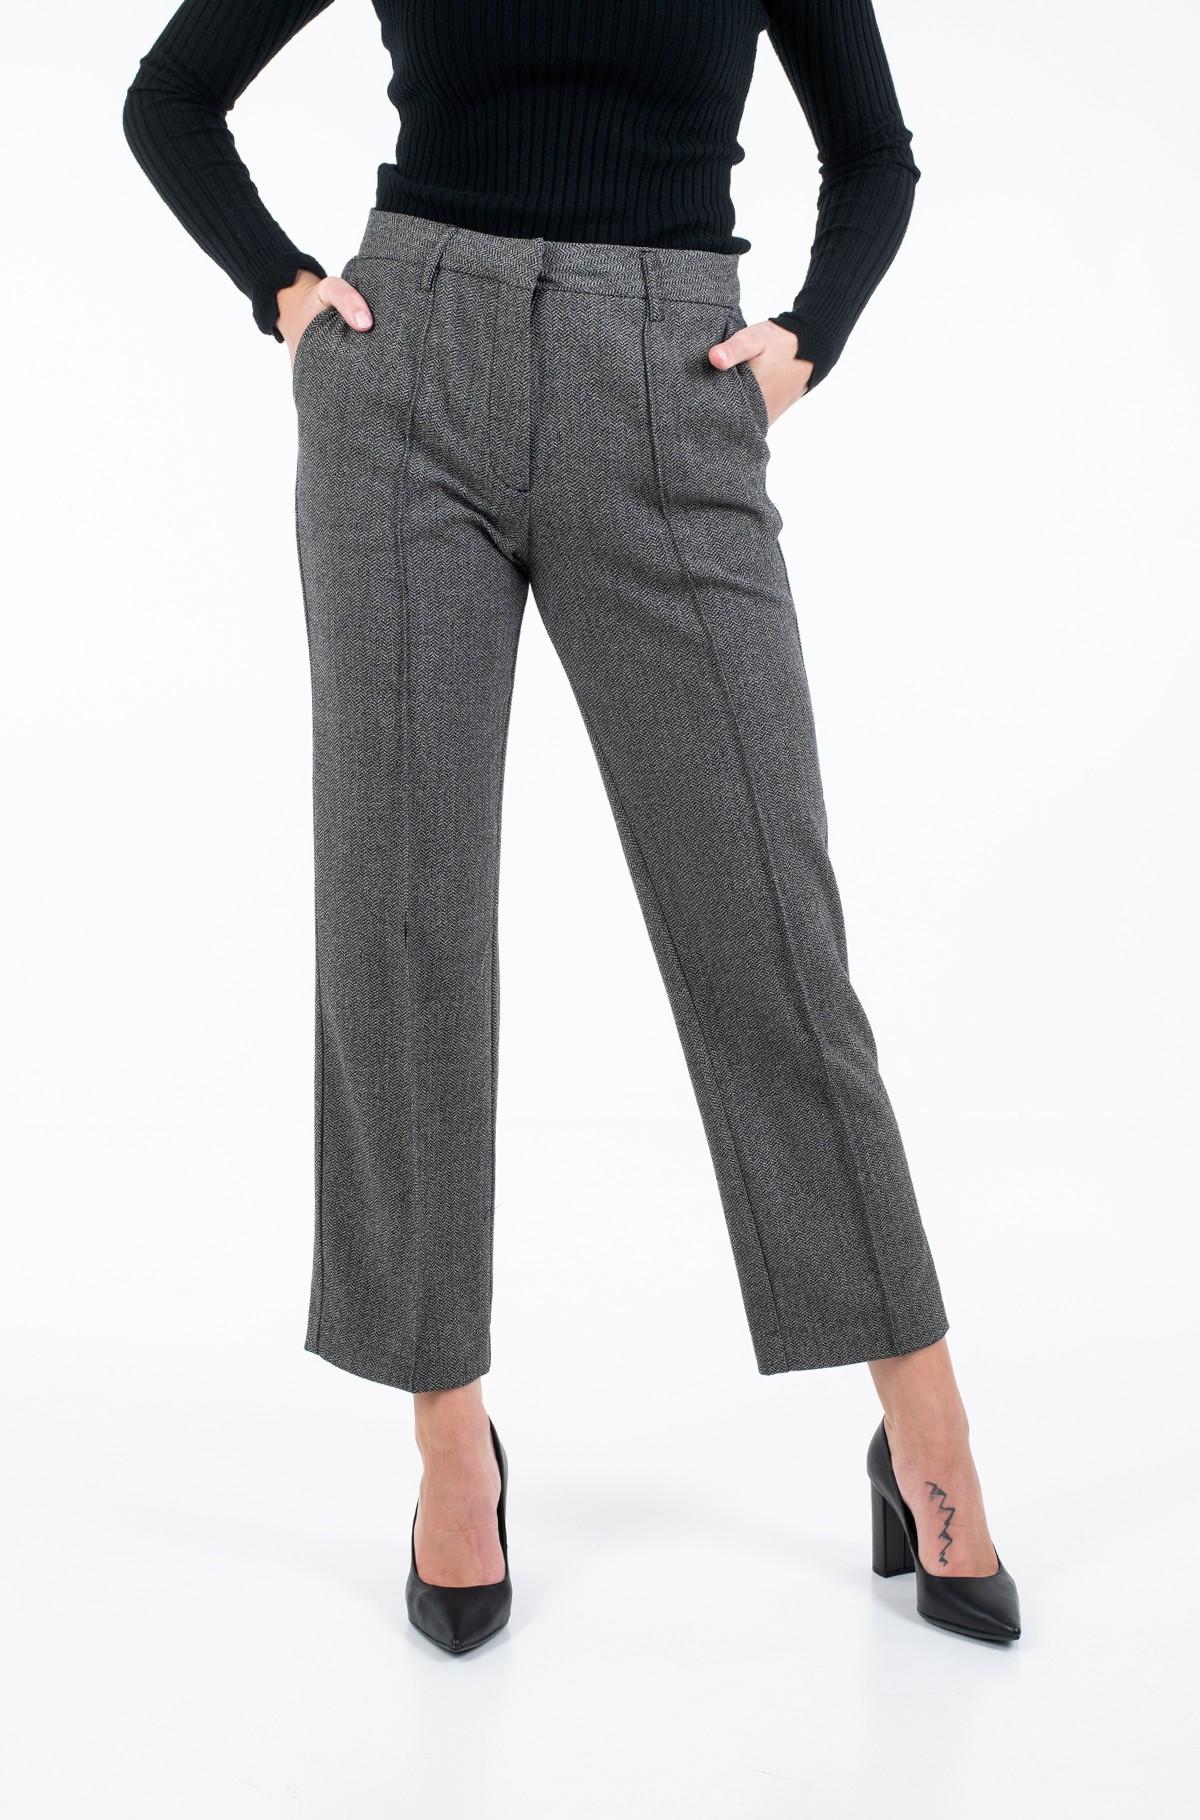 Kelnės su kantu ROSENDA/PL211353-full-1